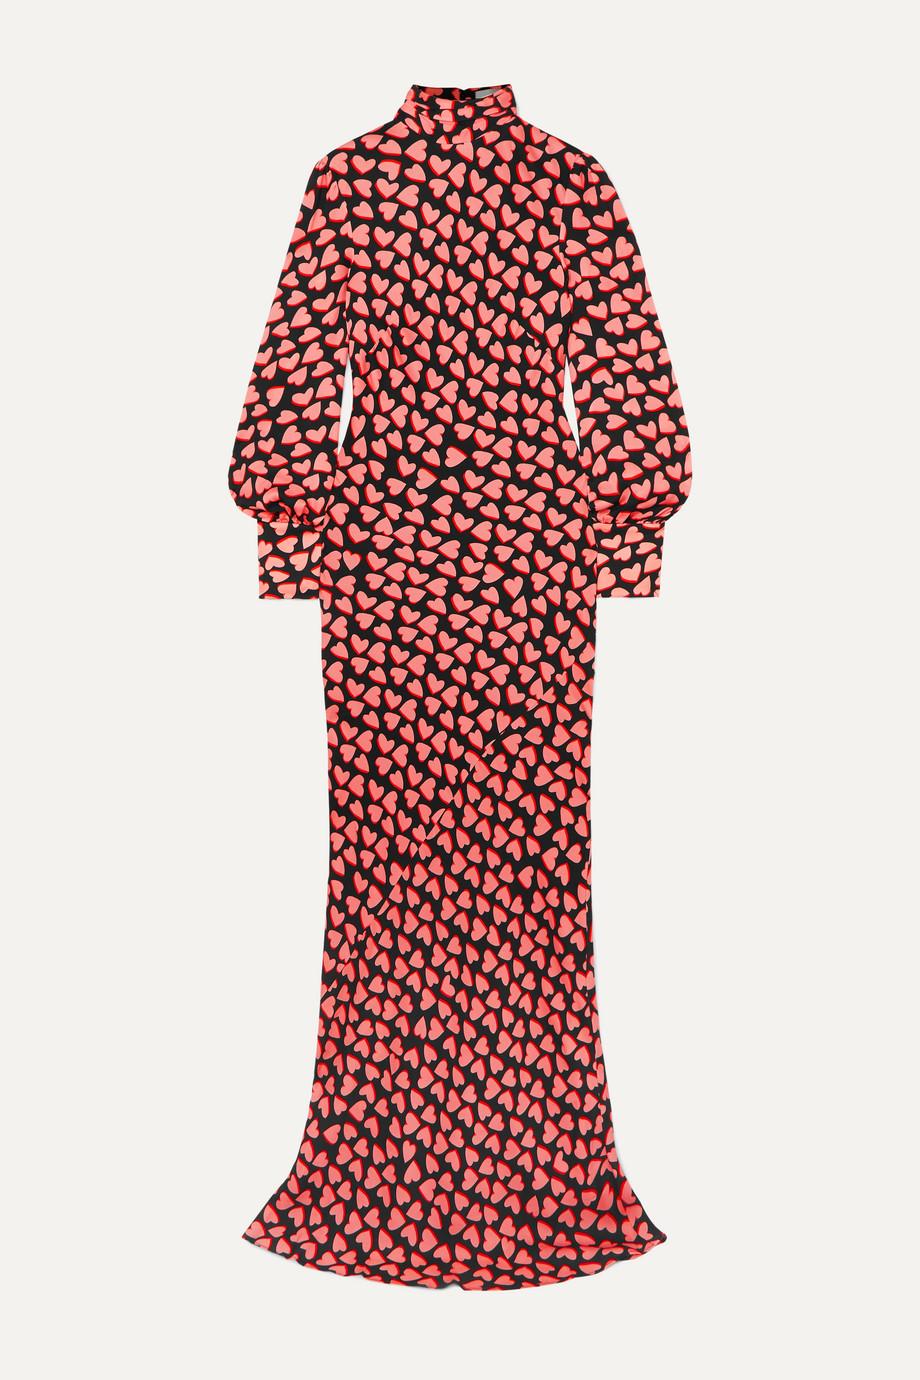 Rebecca Vallance Hotel Beau tie-detailed printed crepe maxi dress